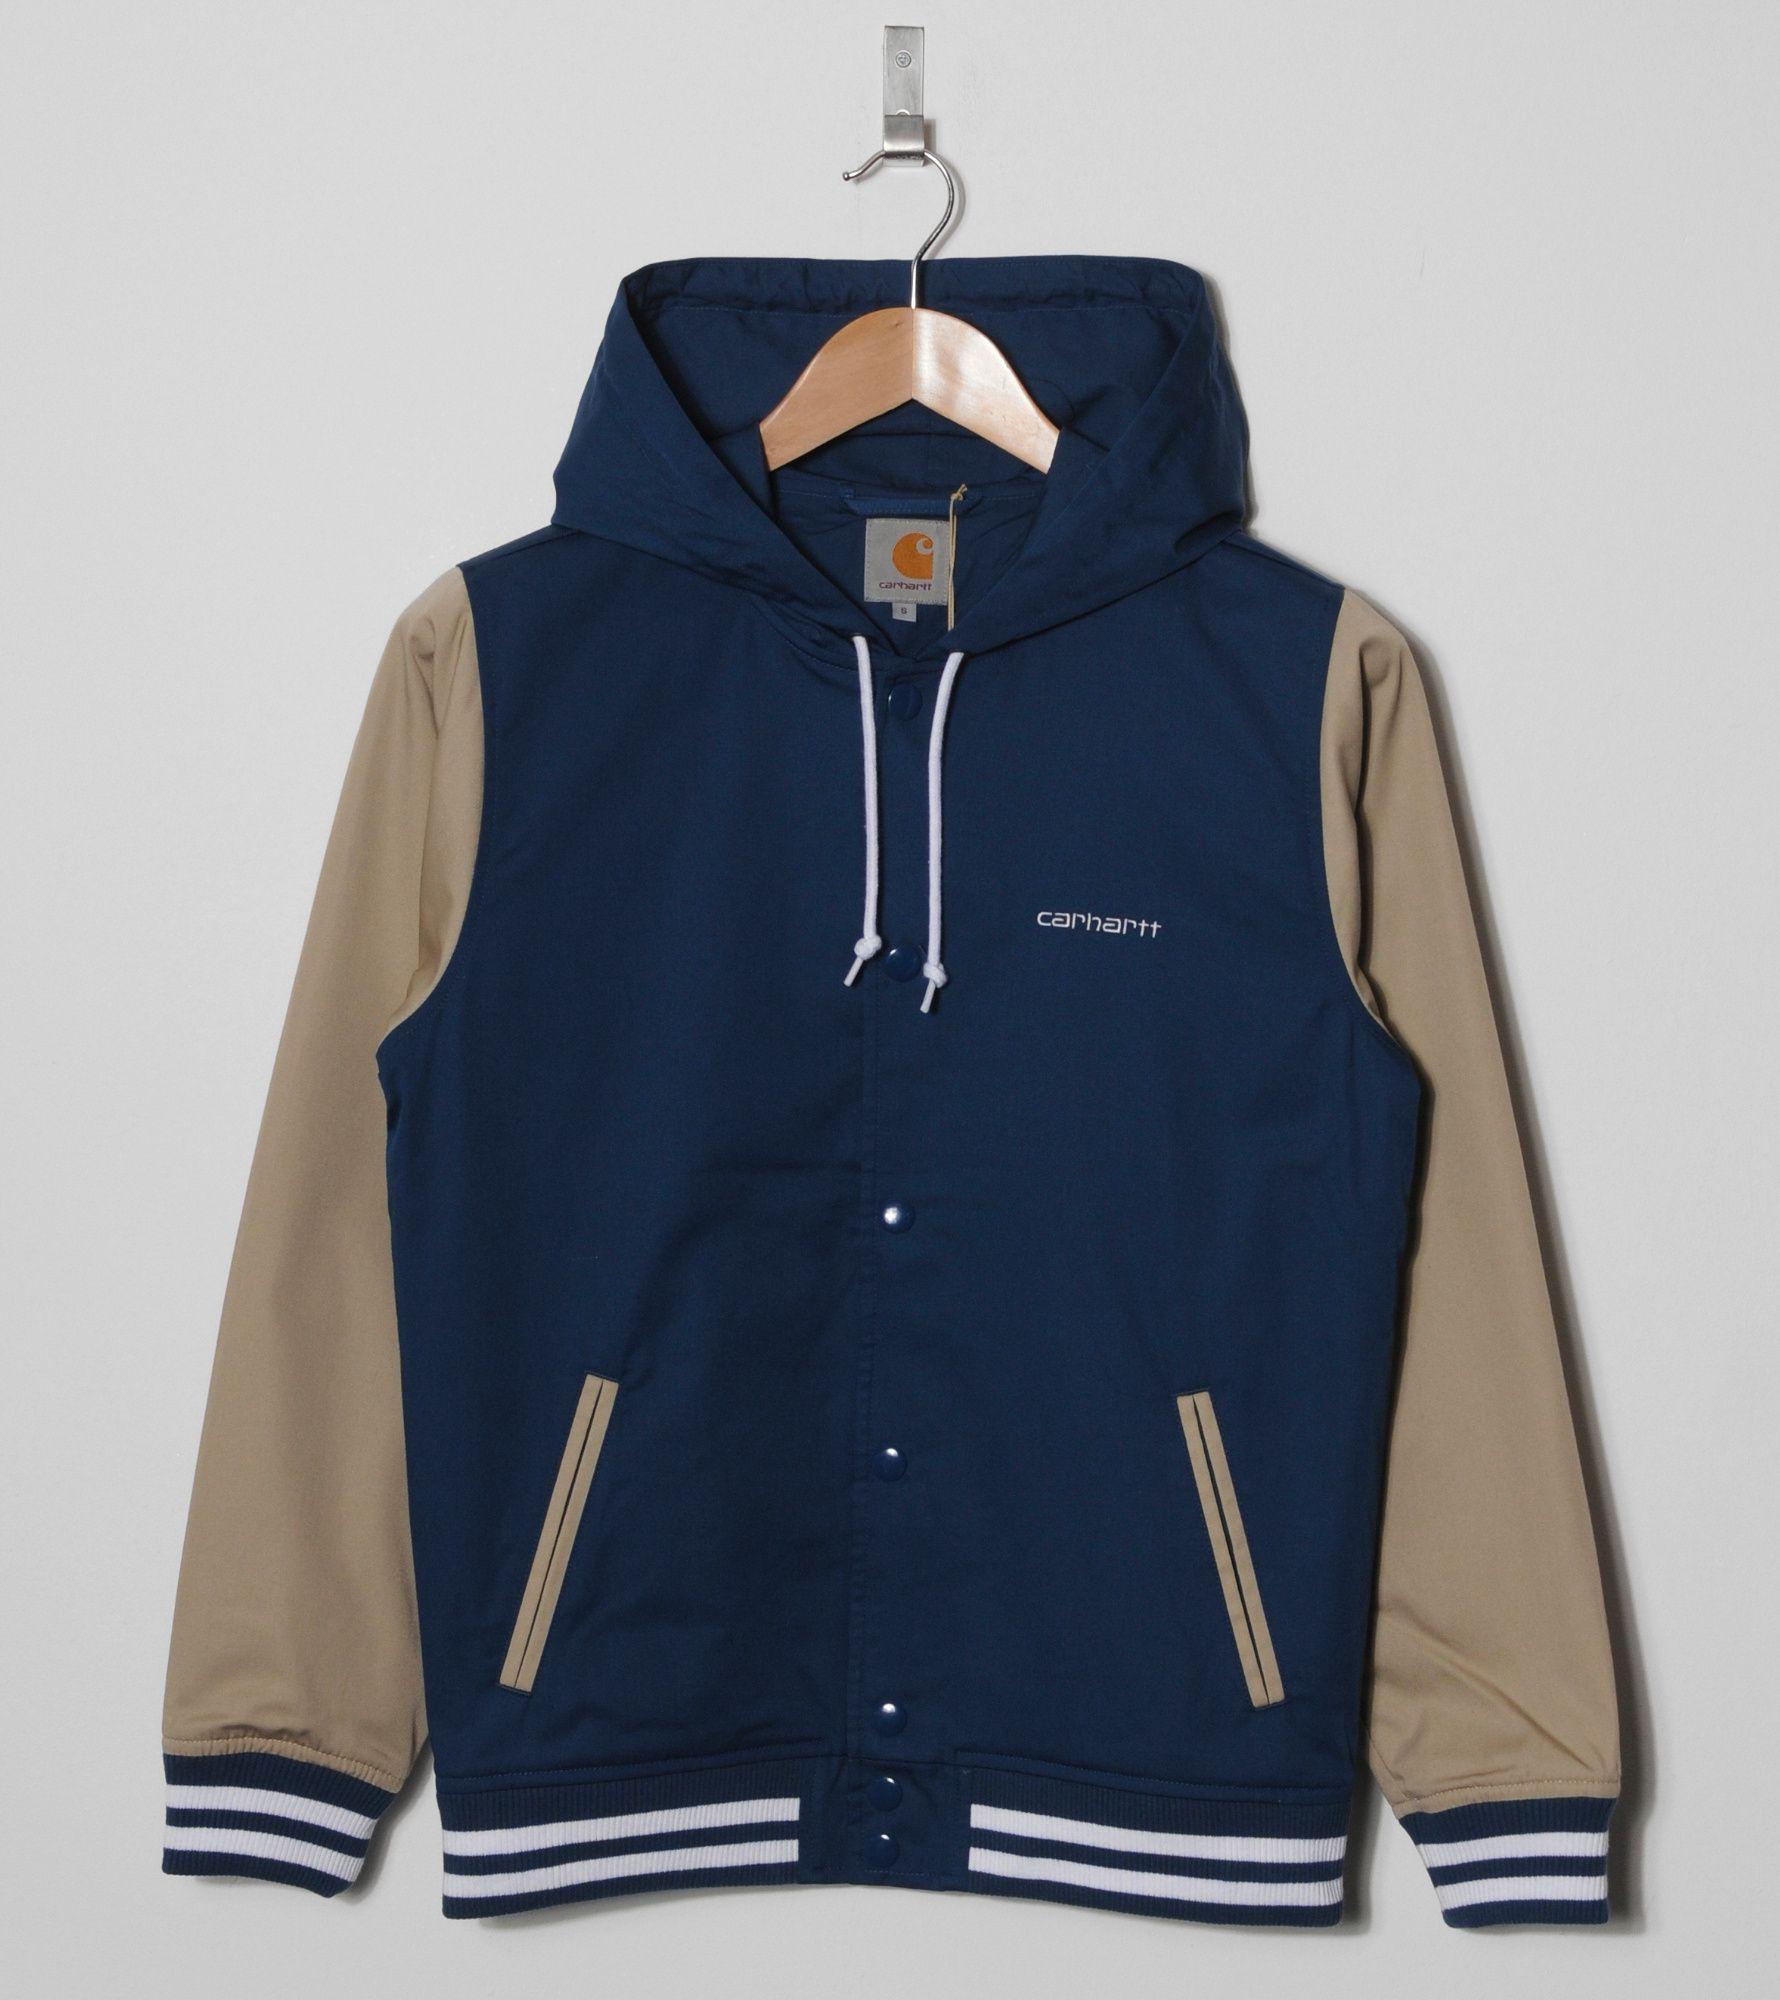 Carhartt WIP Robson Hooded Jacket